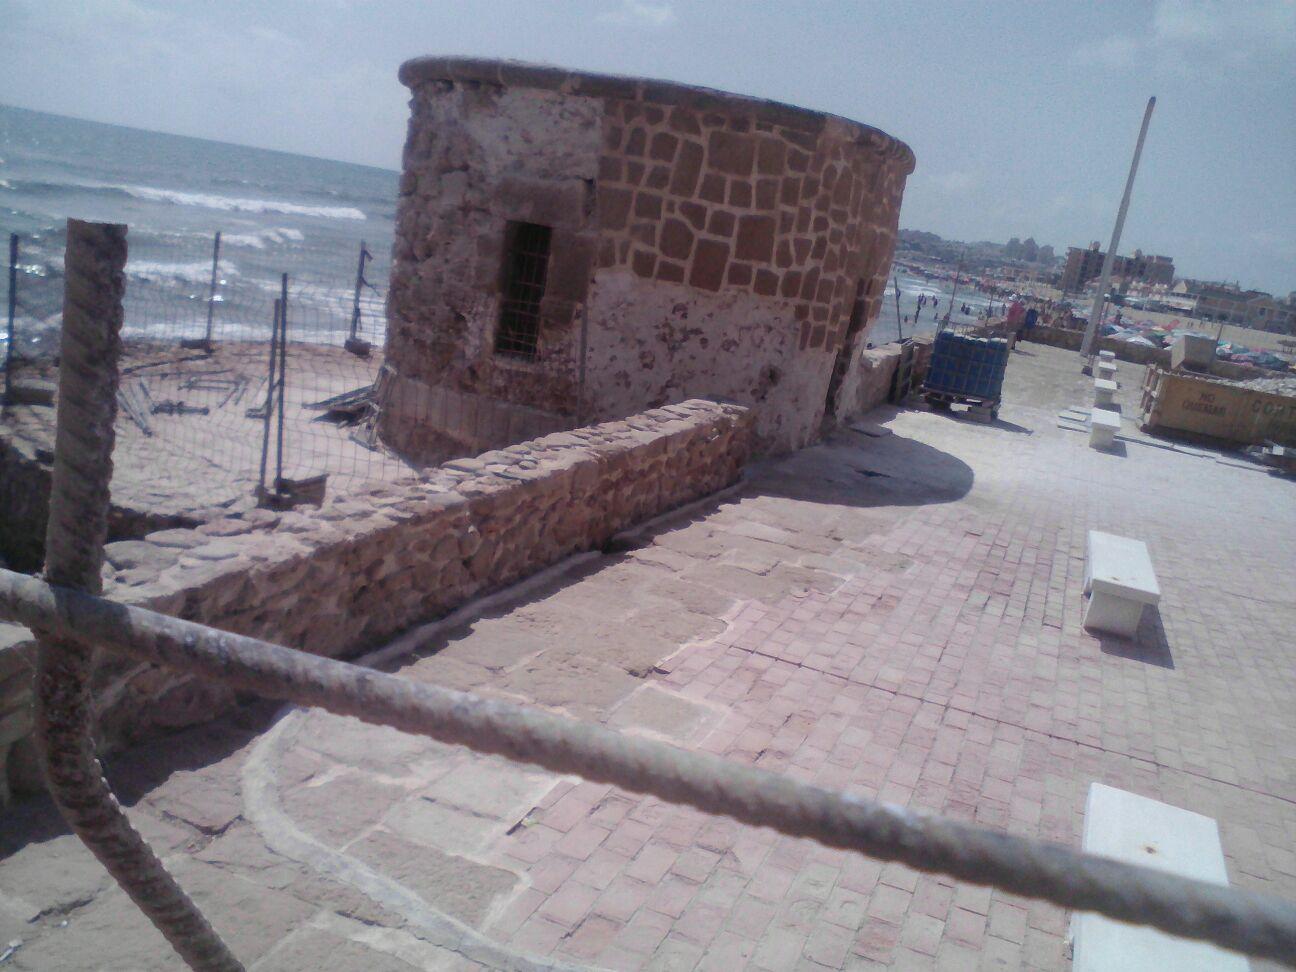 La Mata 14th Century Tower To Undergo Repairs The Leader Newspaper # Muebles Domingo Los Montesinos